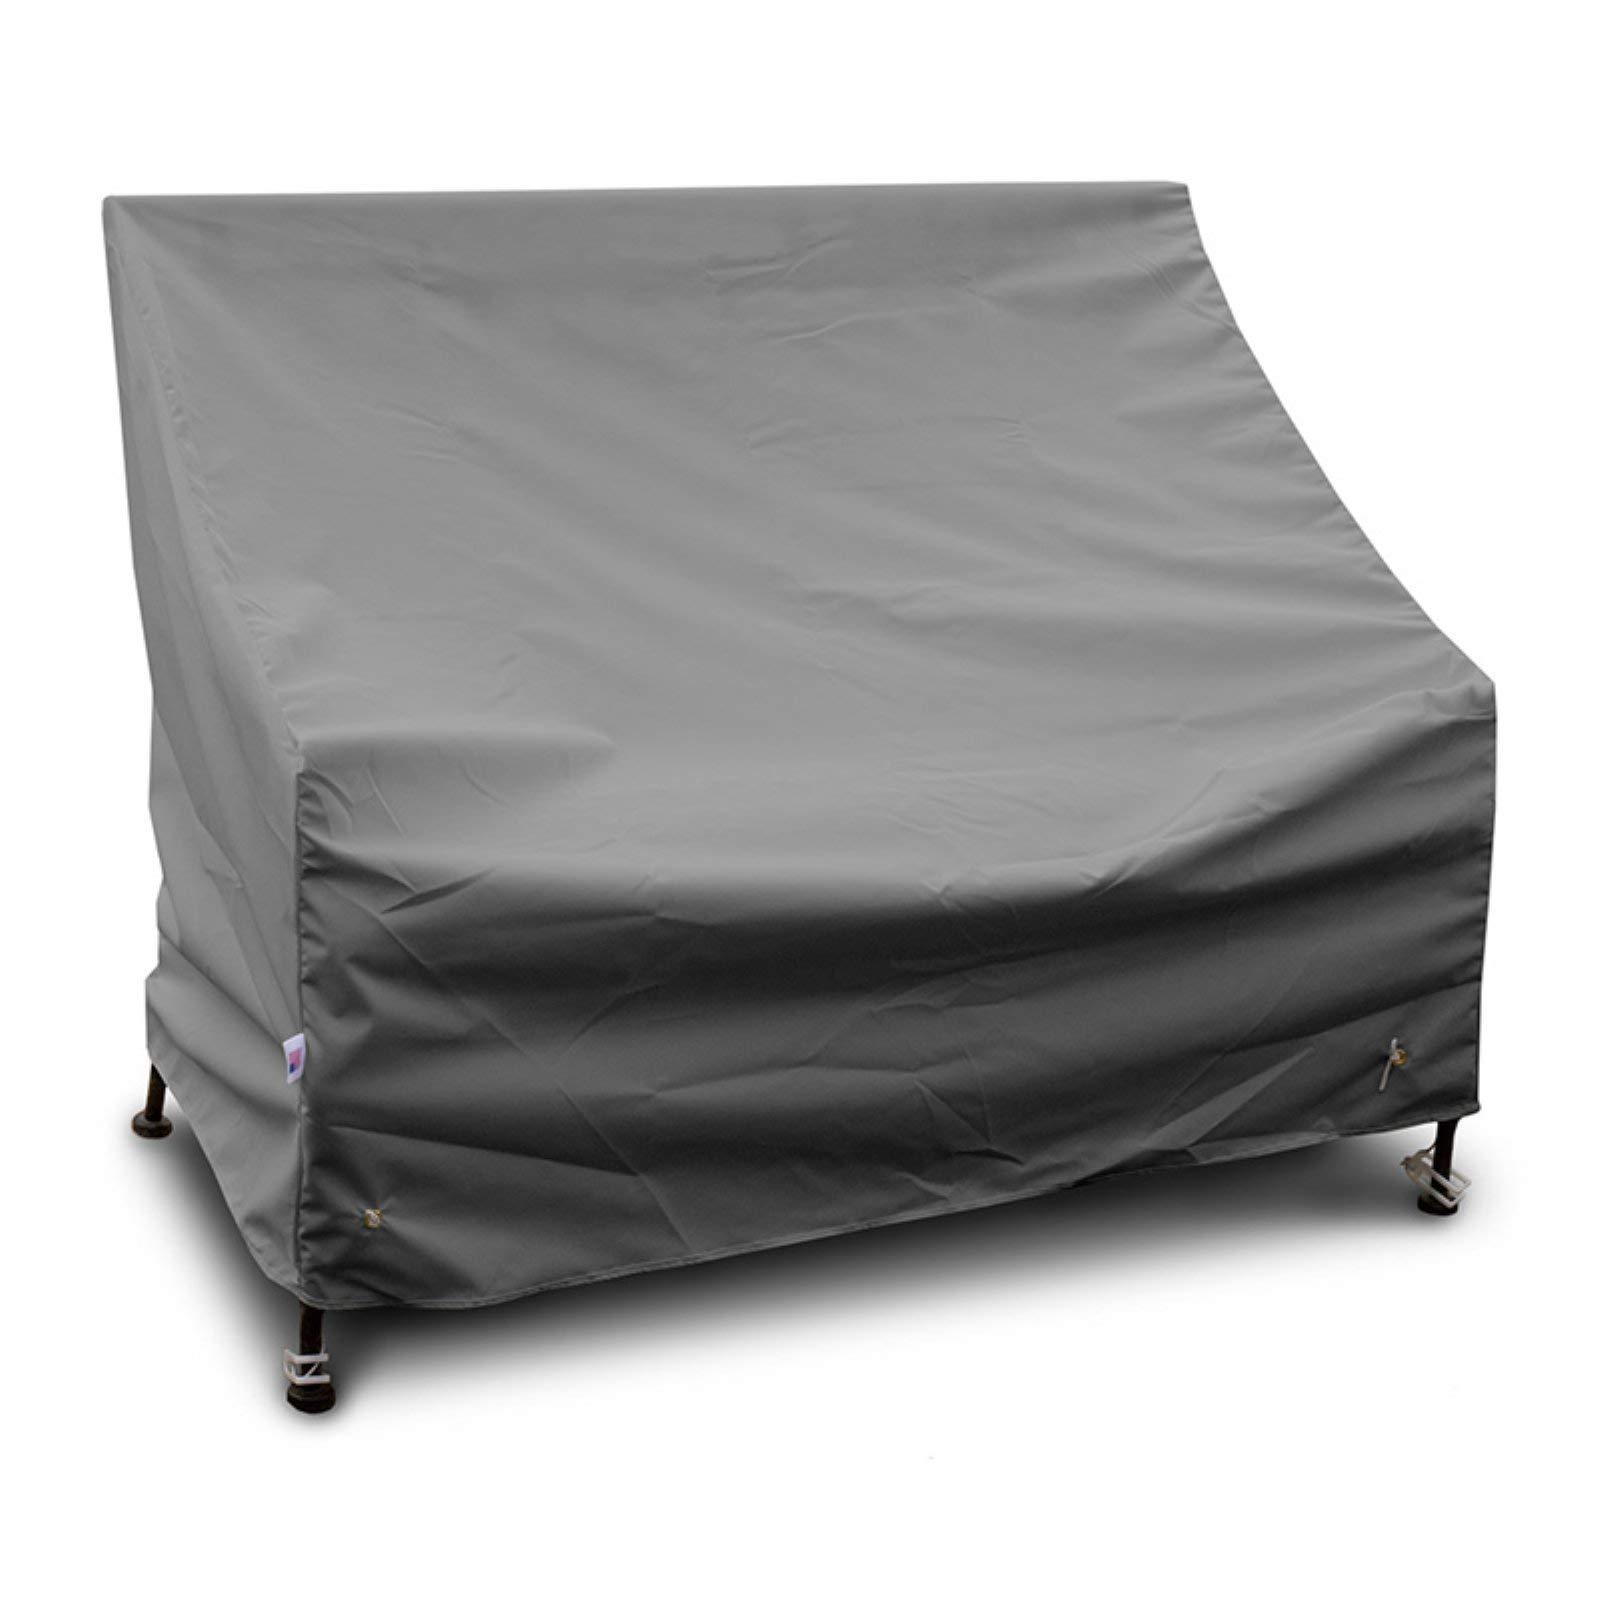 OKSLO Weather highback loveseat/sofa cover model x1933